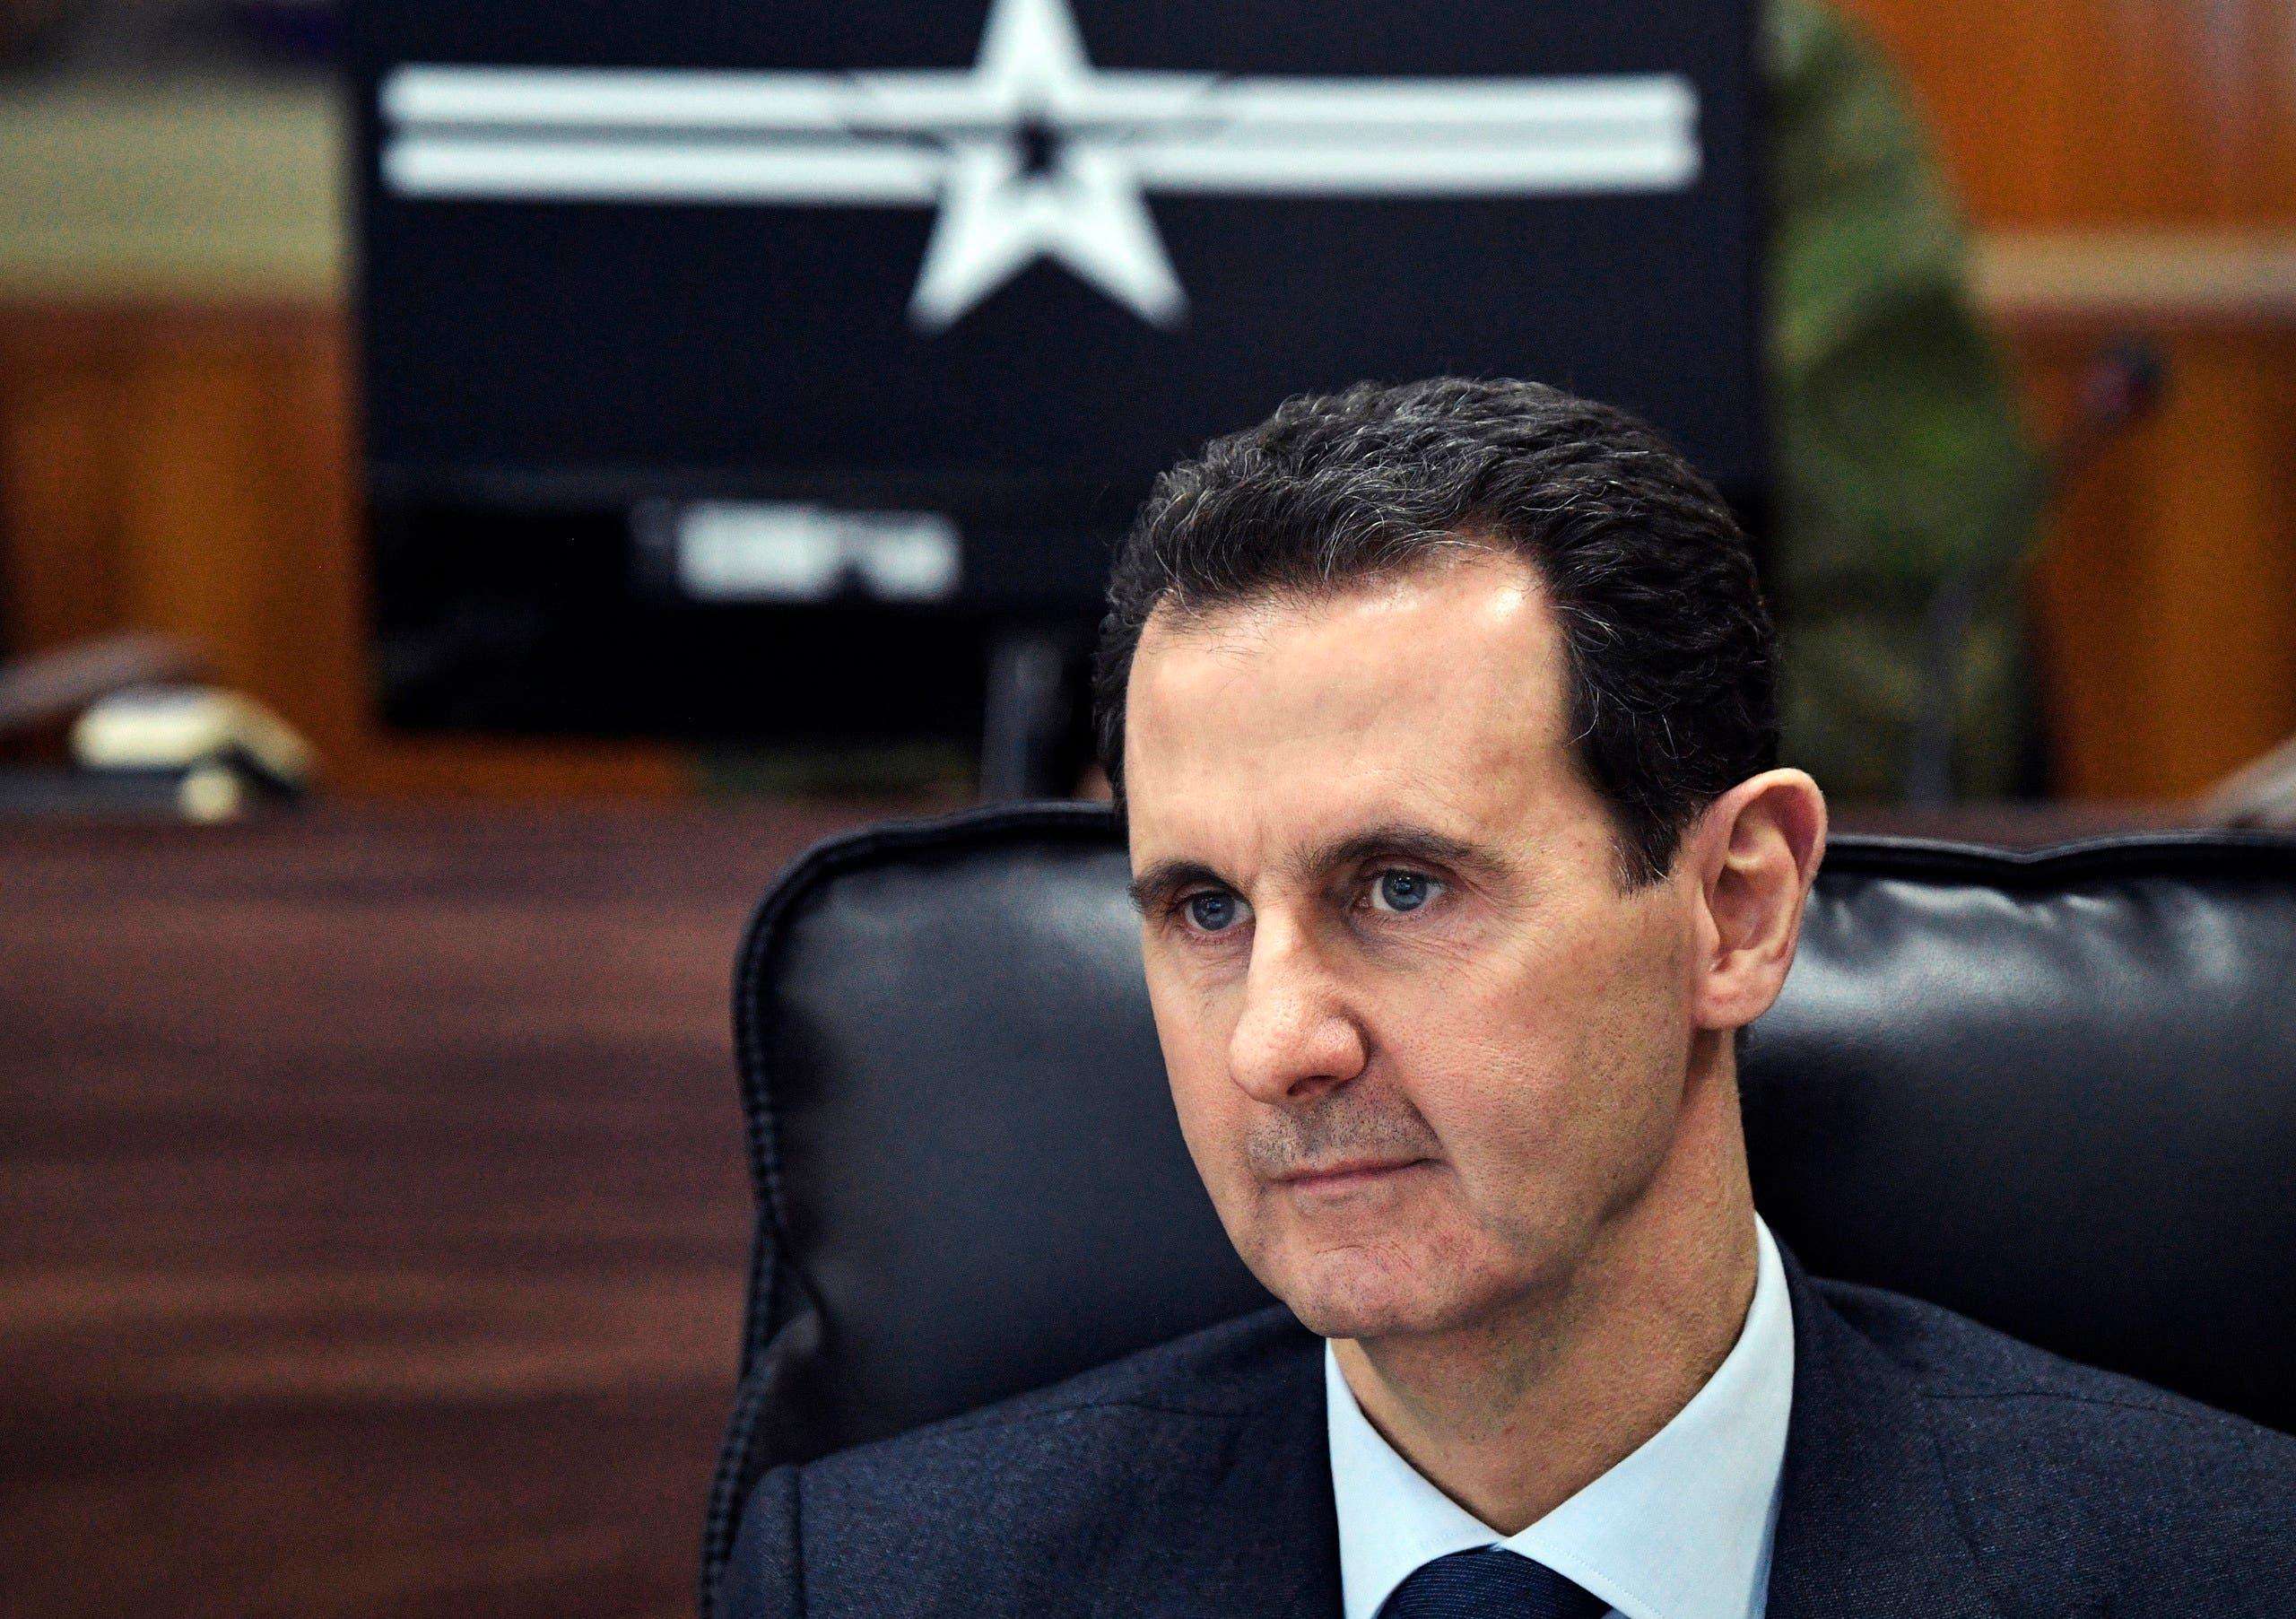 Syrian President Bashar Assad listens to Russian President Vladimir Putin during their meeting in Damascus, Syria on Jan. 7, 2020. (AP)